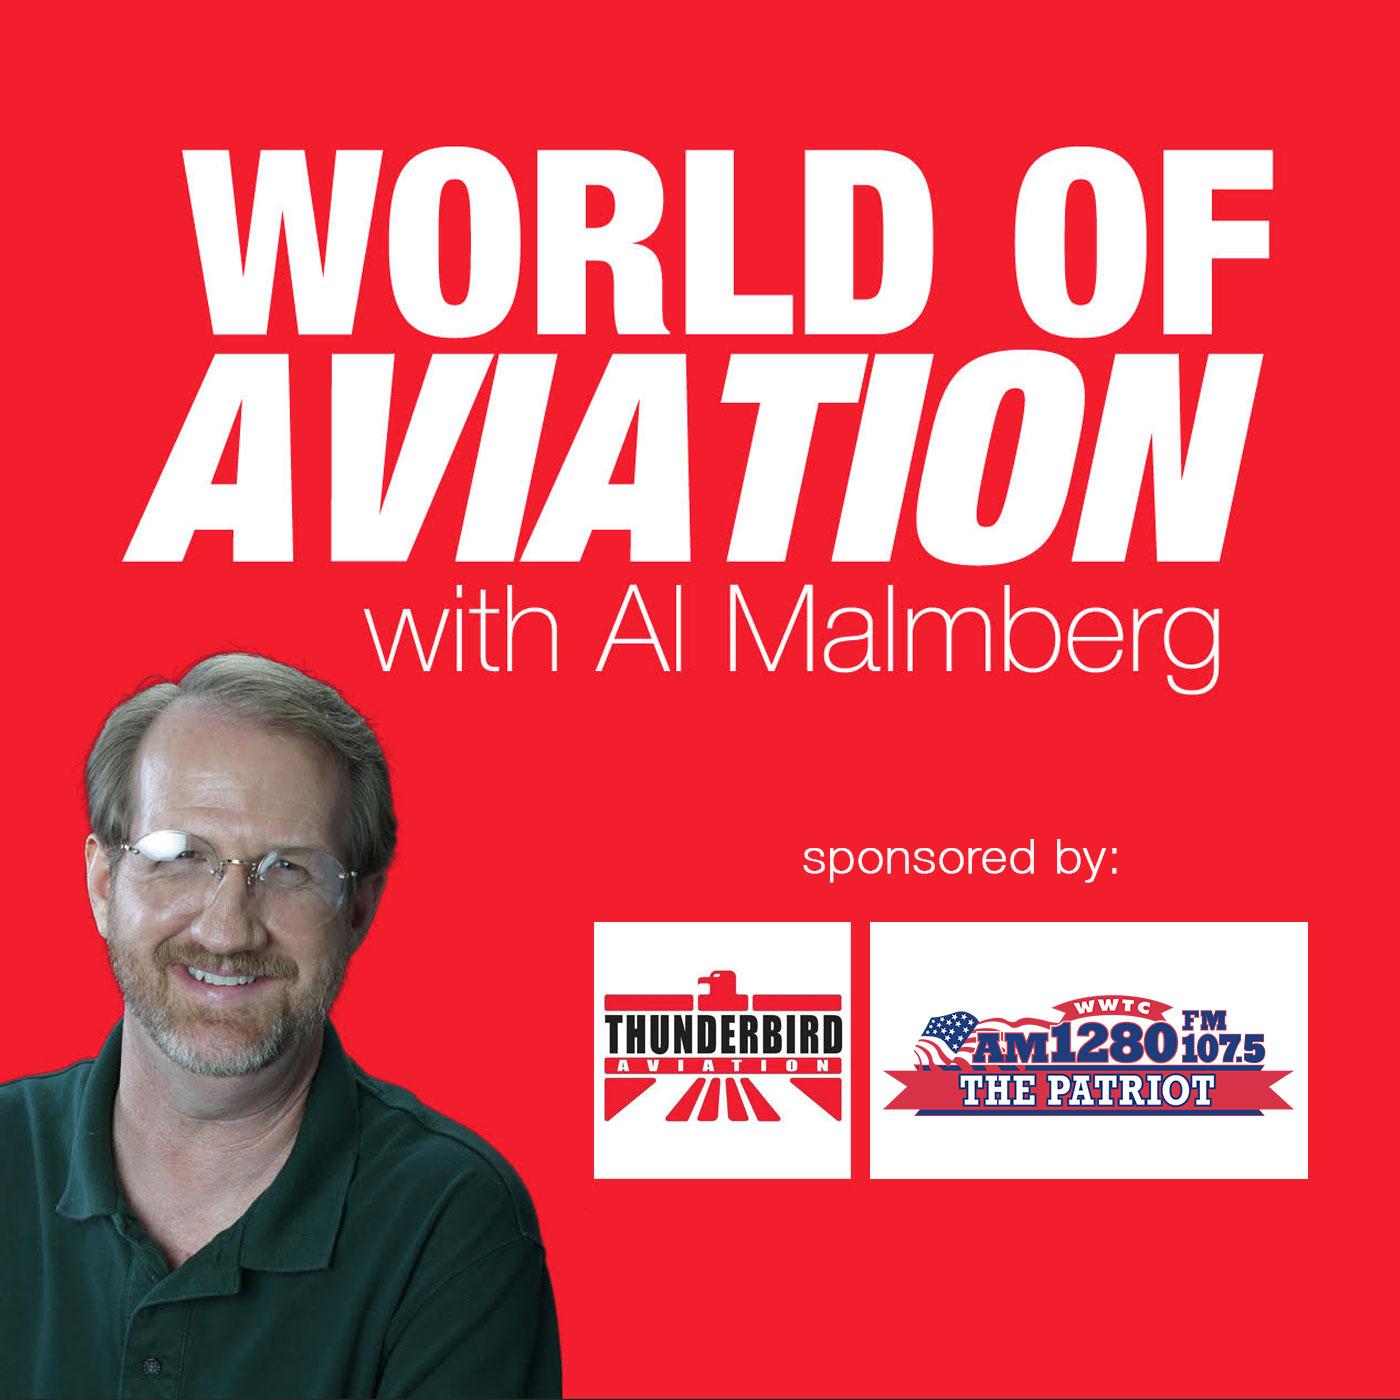 Employment-at-Thunderbird-Aviation